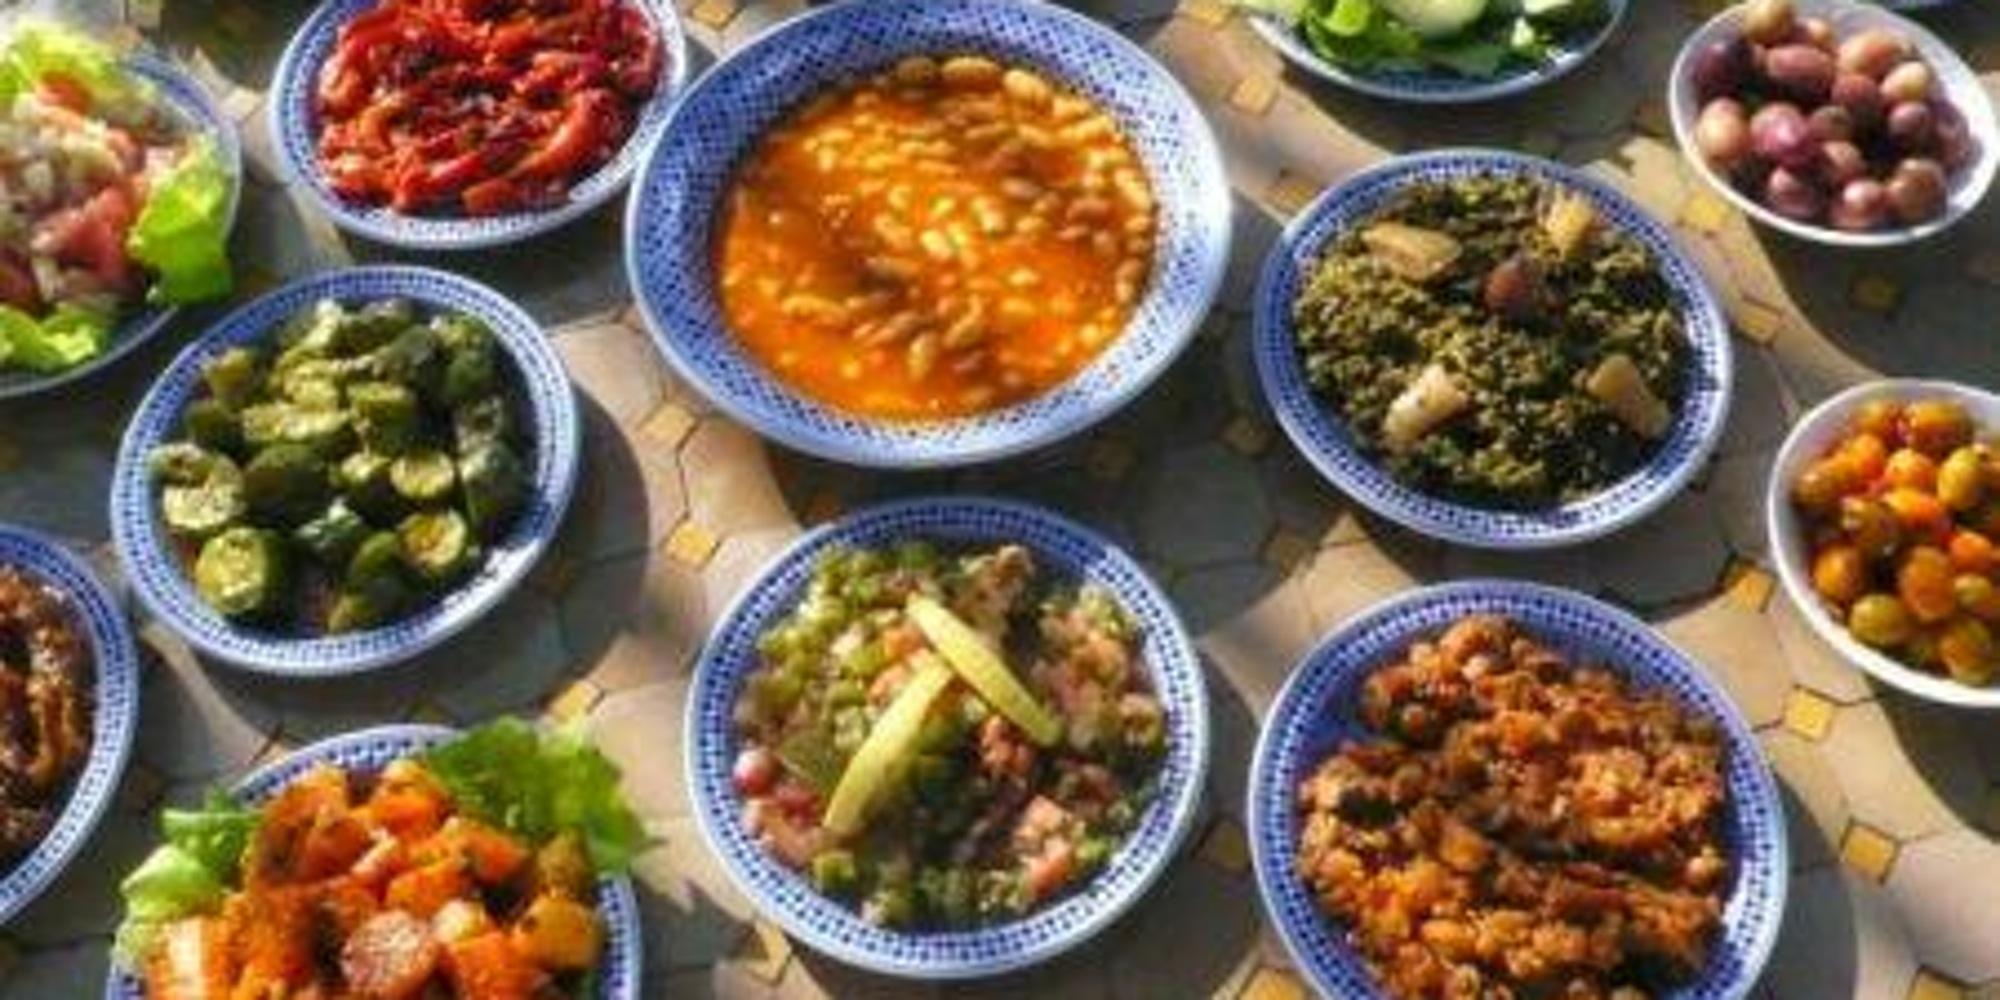 moroccan cuisine 11 29 16. Black Bedroom Furniture Sets. Home Design Ideas